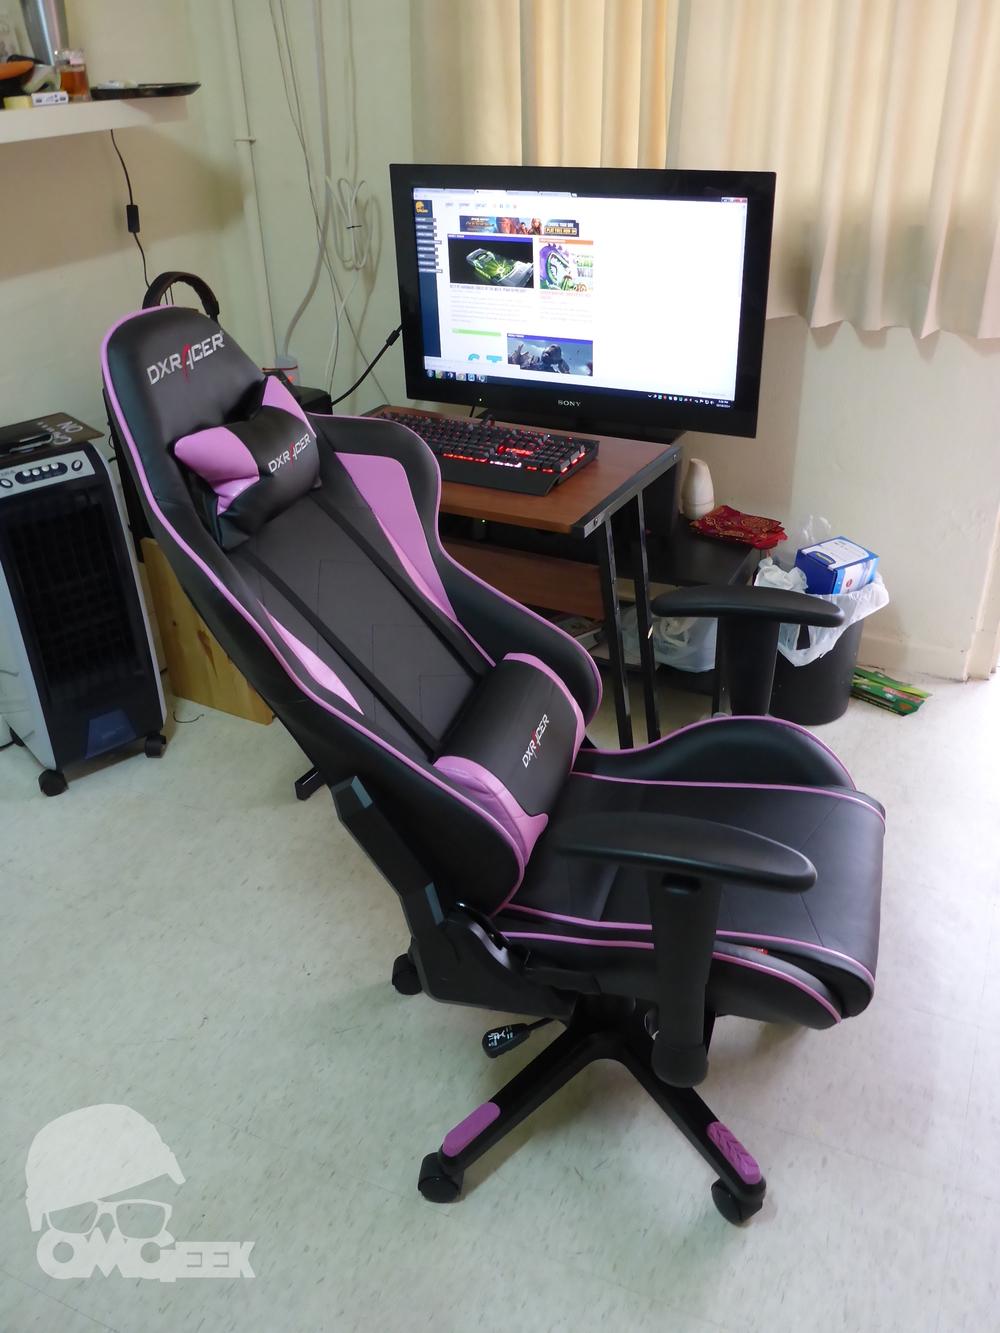 Pink desk chairs - Dxracer Formula Series Review Omgeek